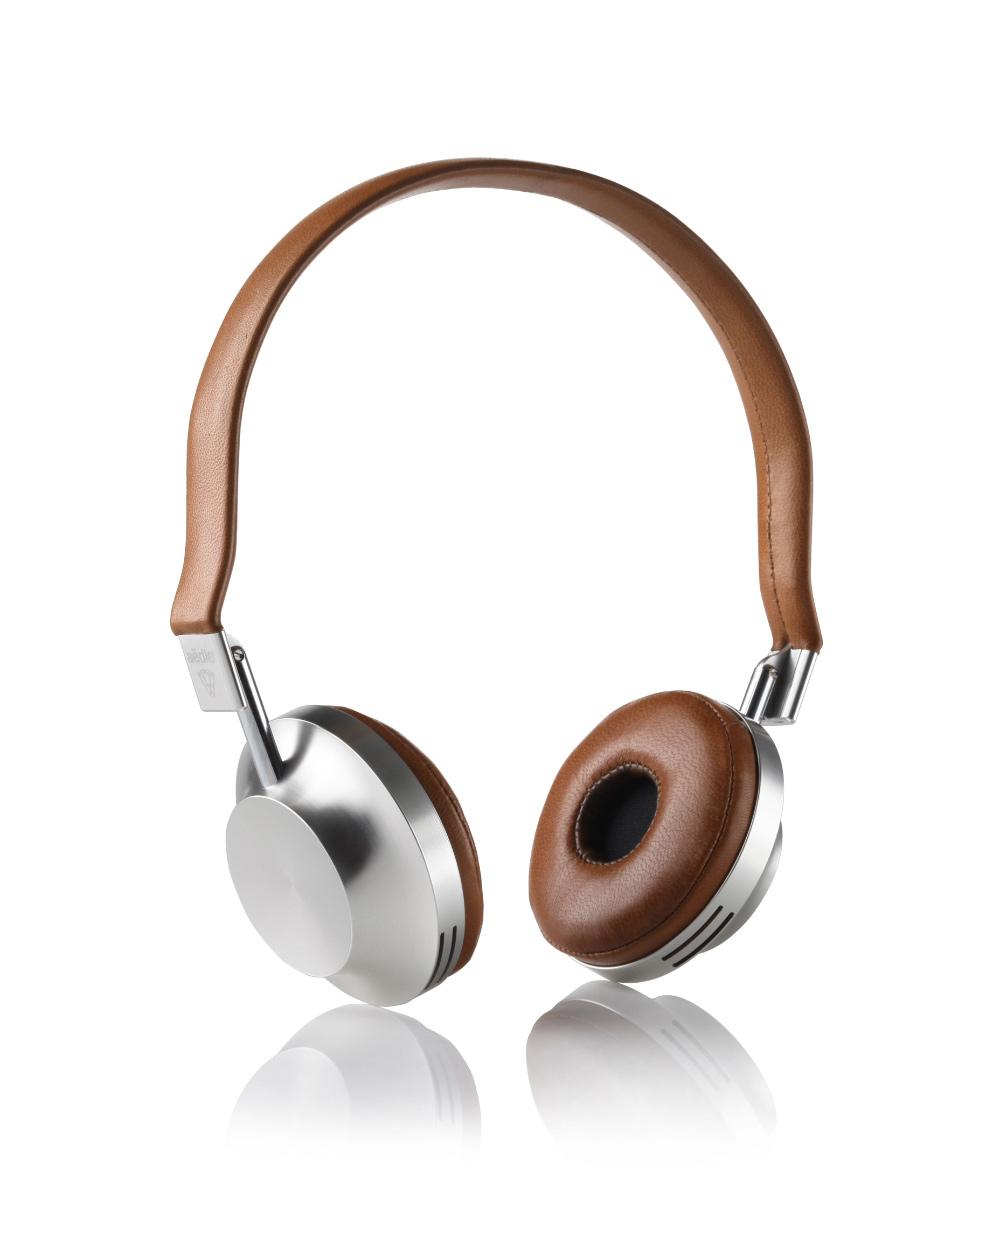 Aedle Valkyrie VK-1 headphones